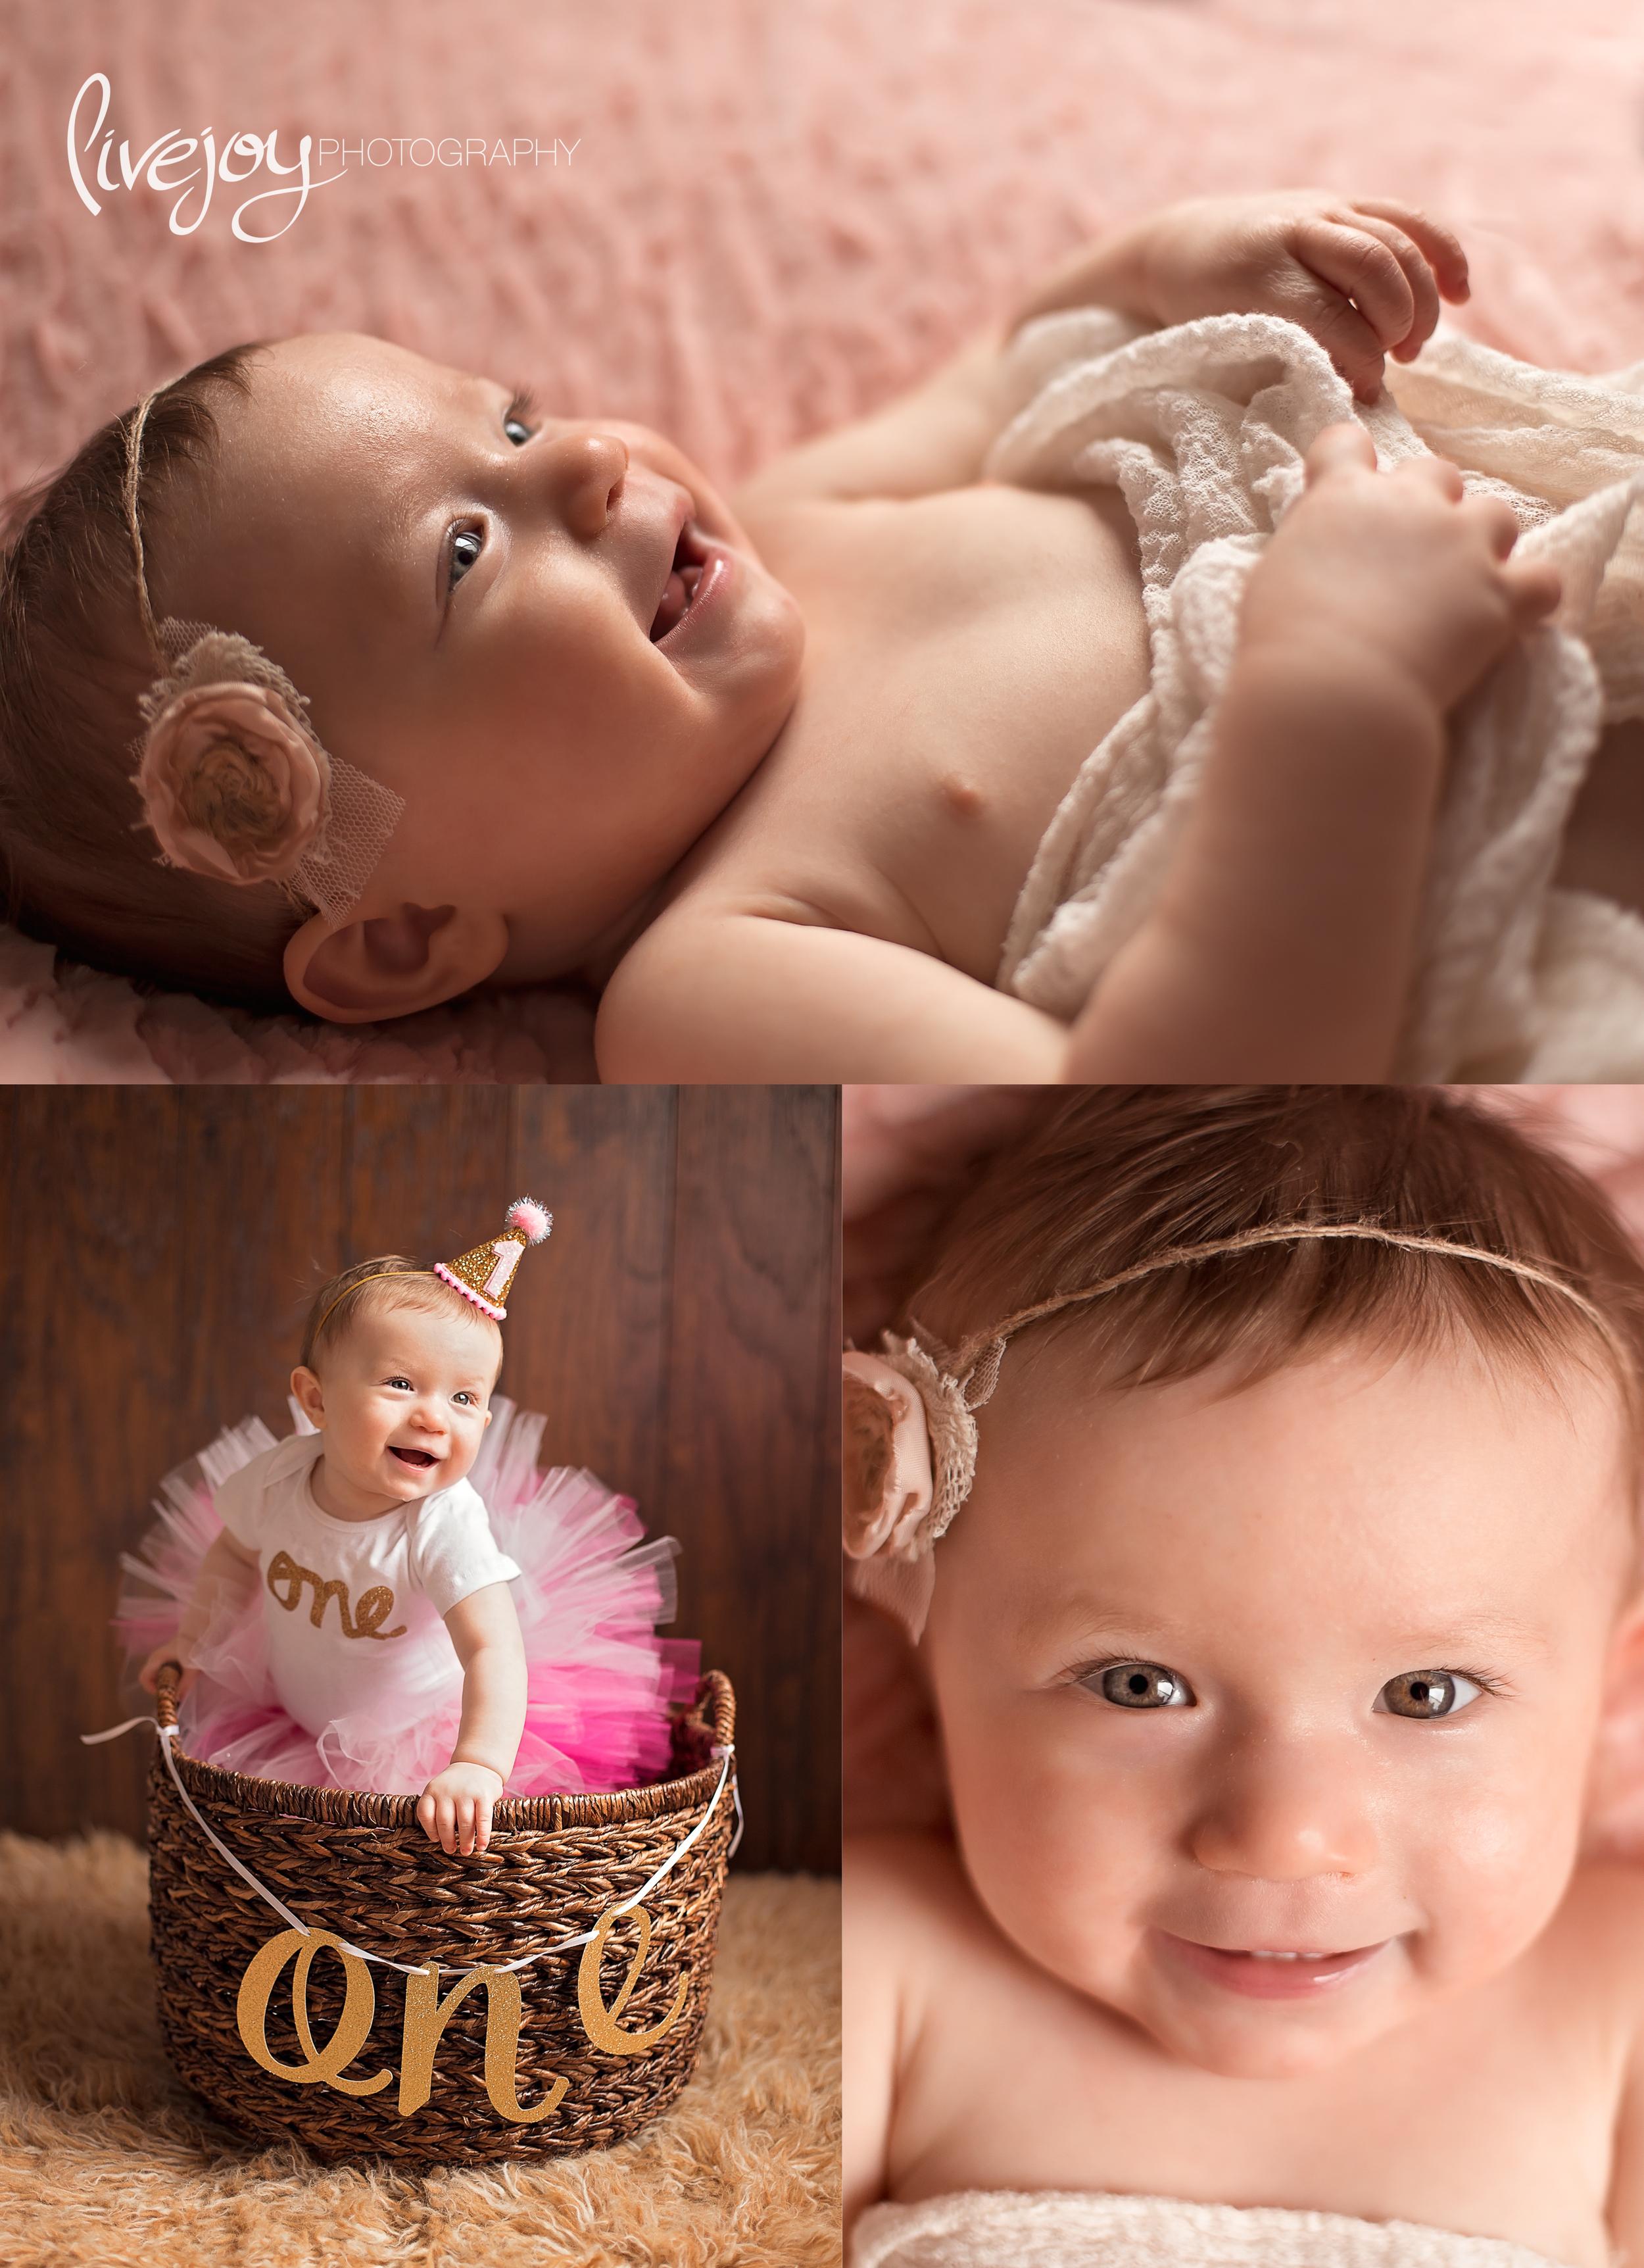 1 Year Baby Photography | Oregon | LiveJoy Photography